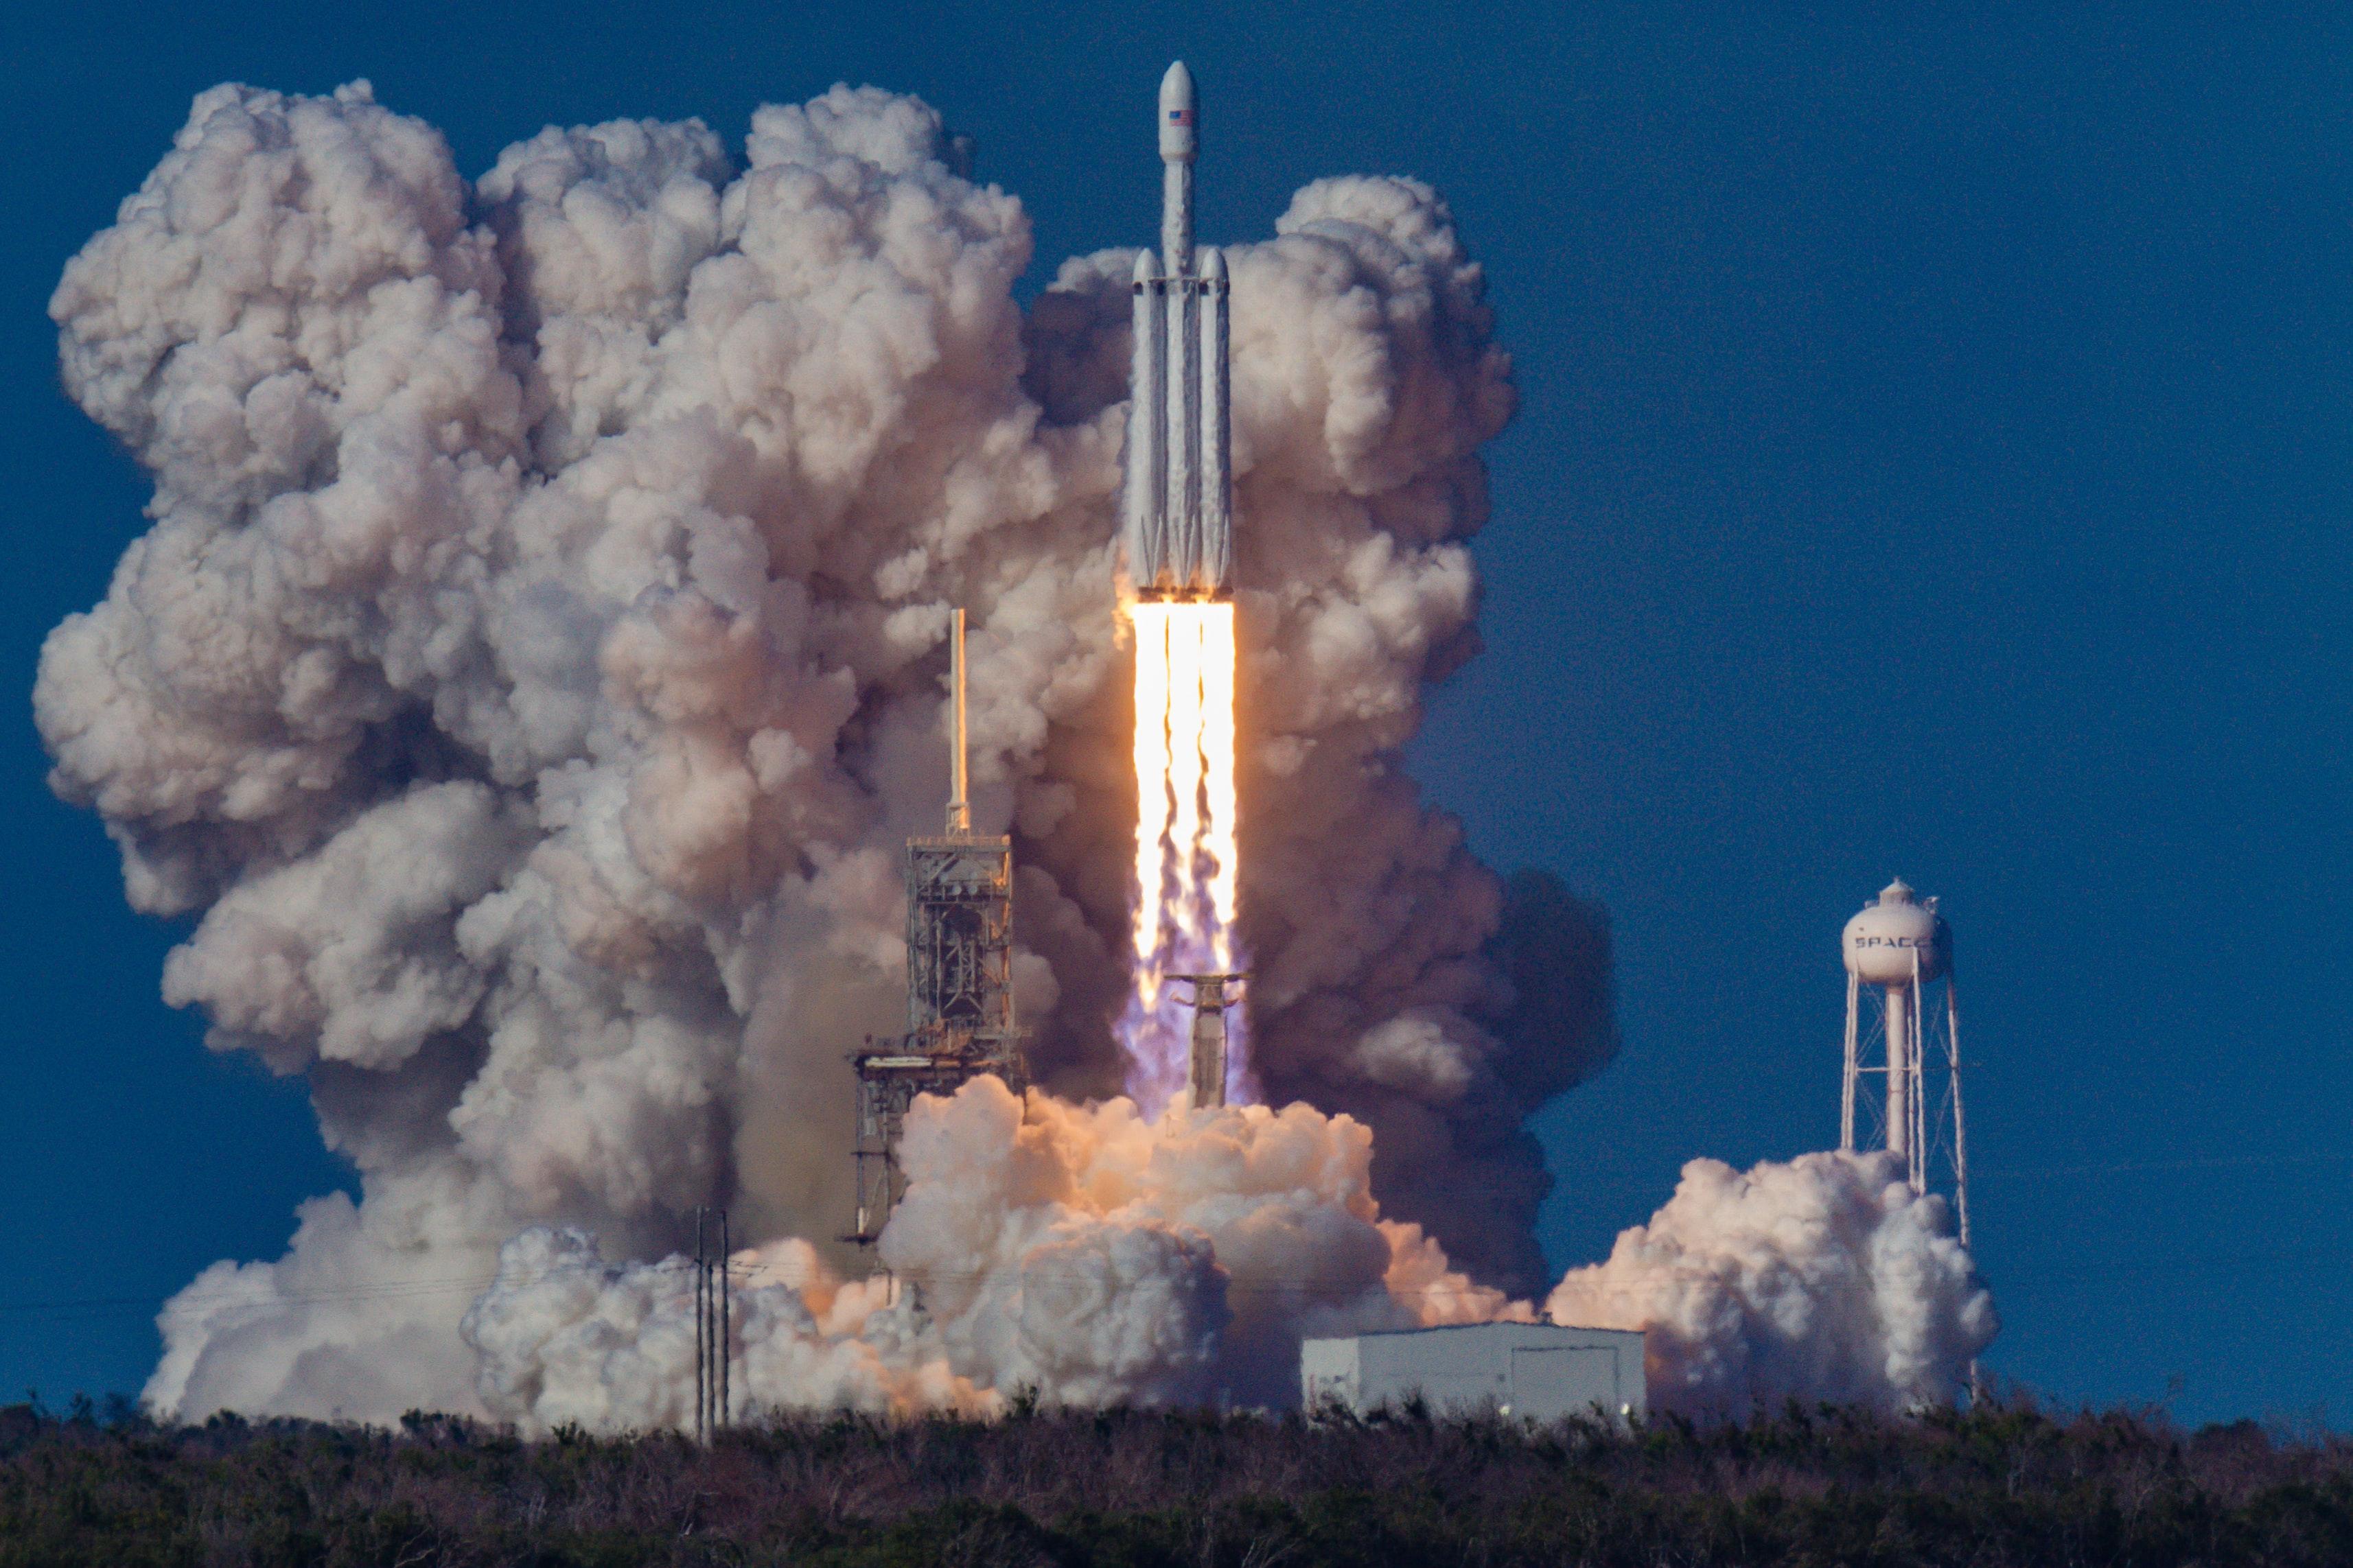 best rocket pictures hd download free images on unsplash